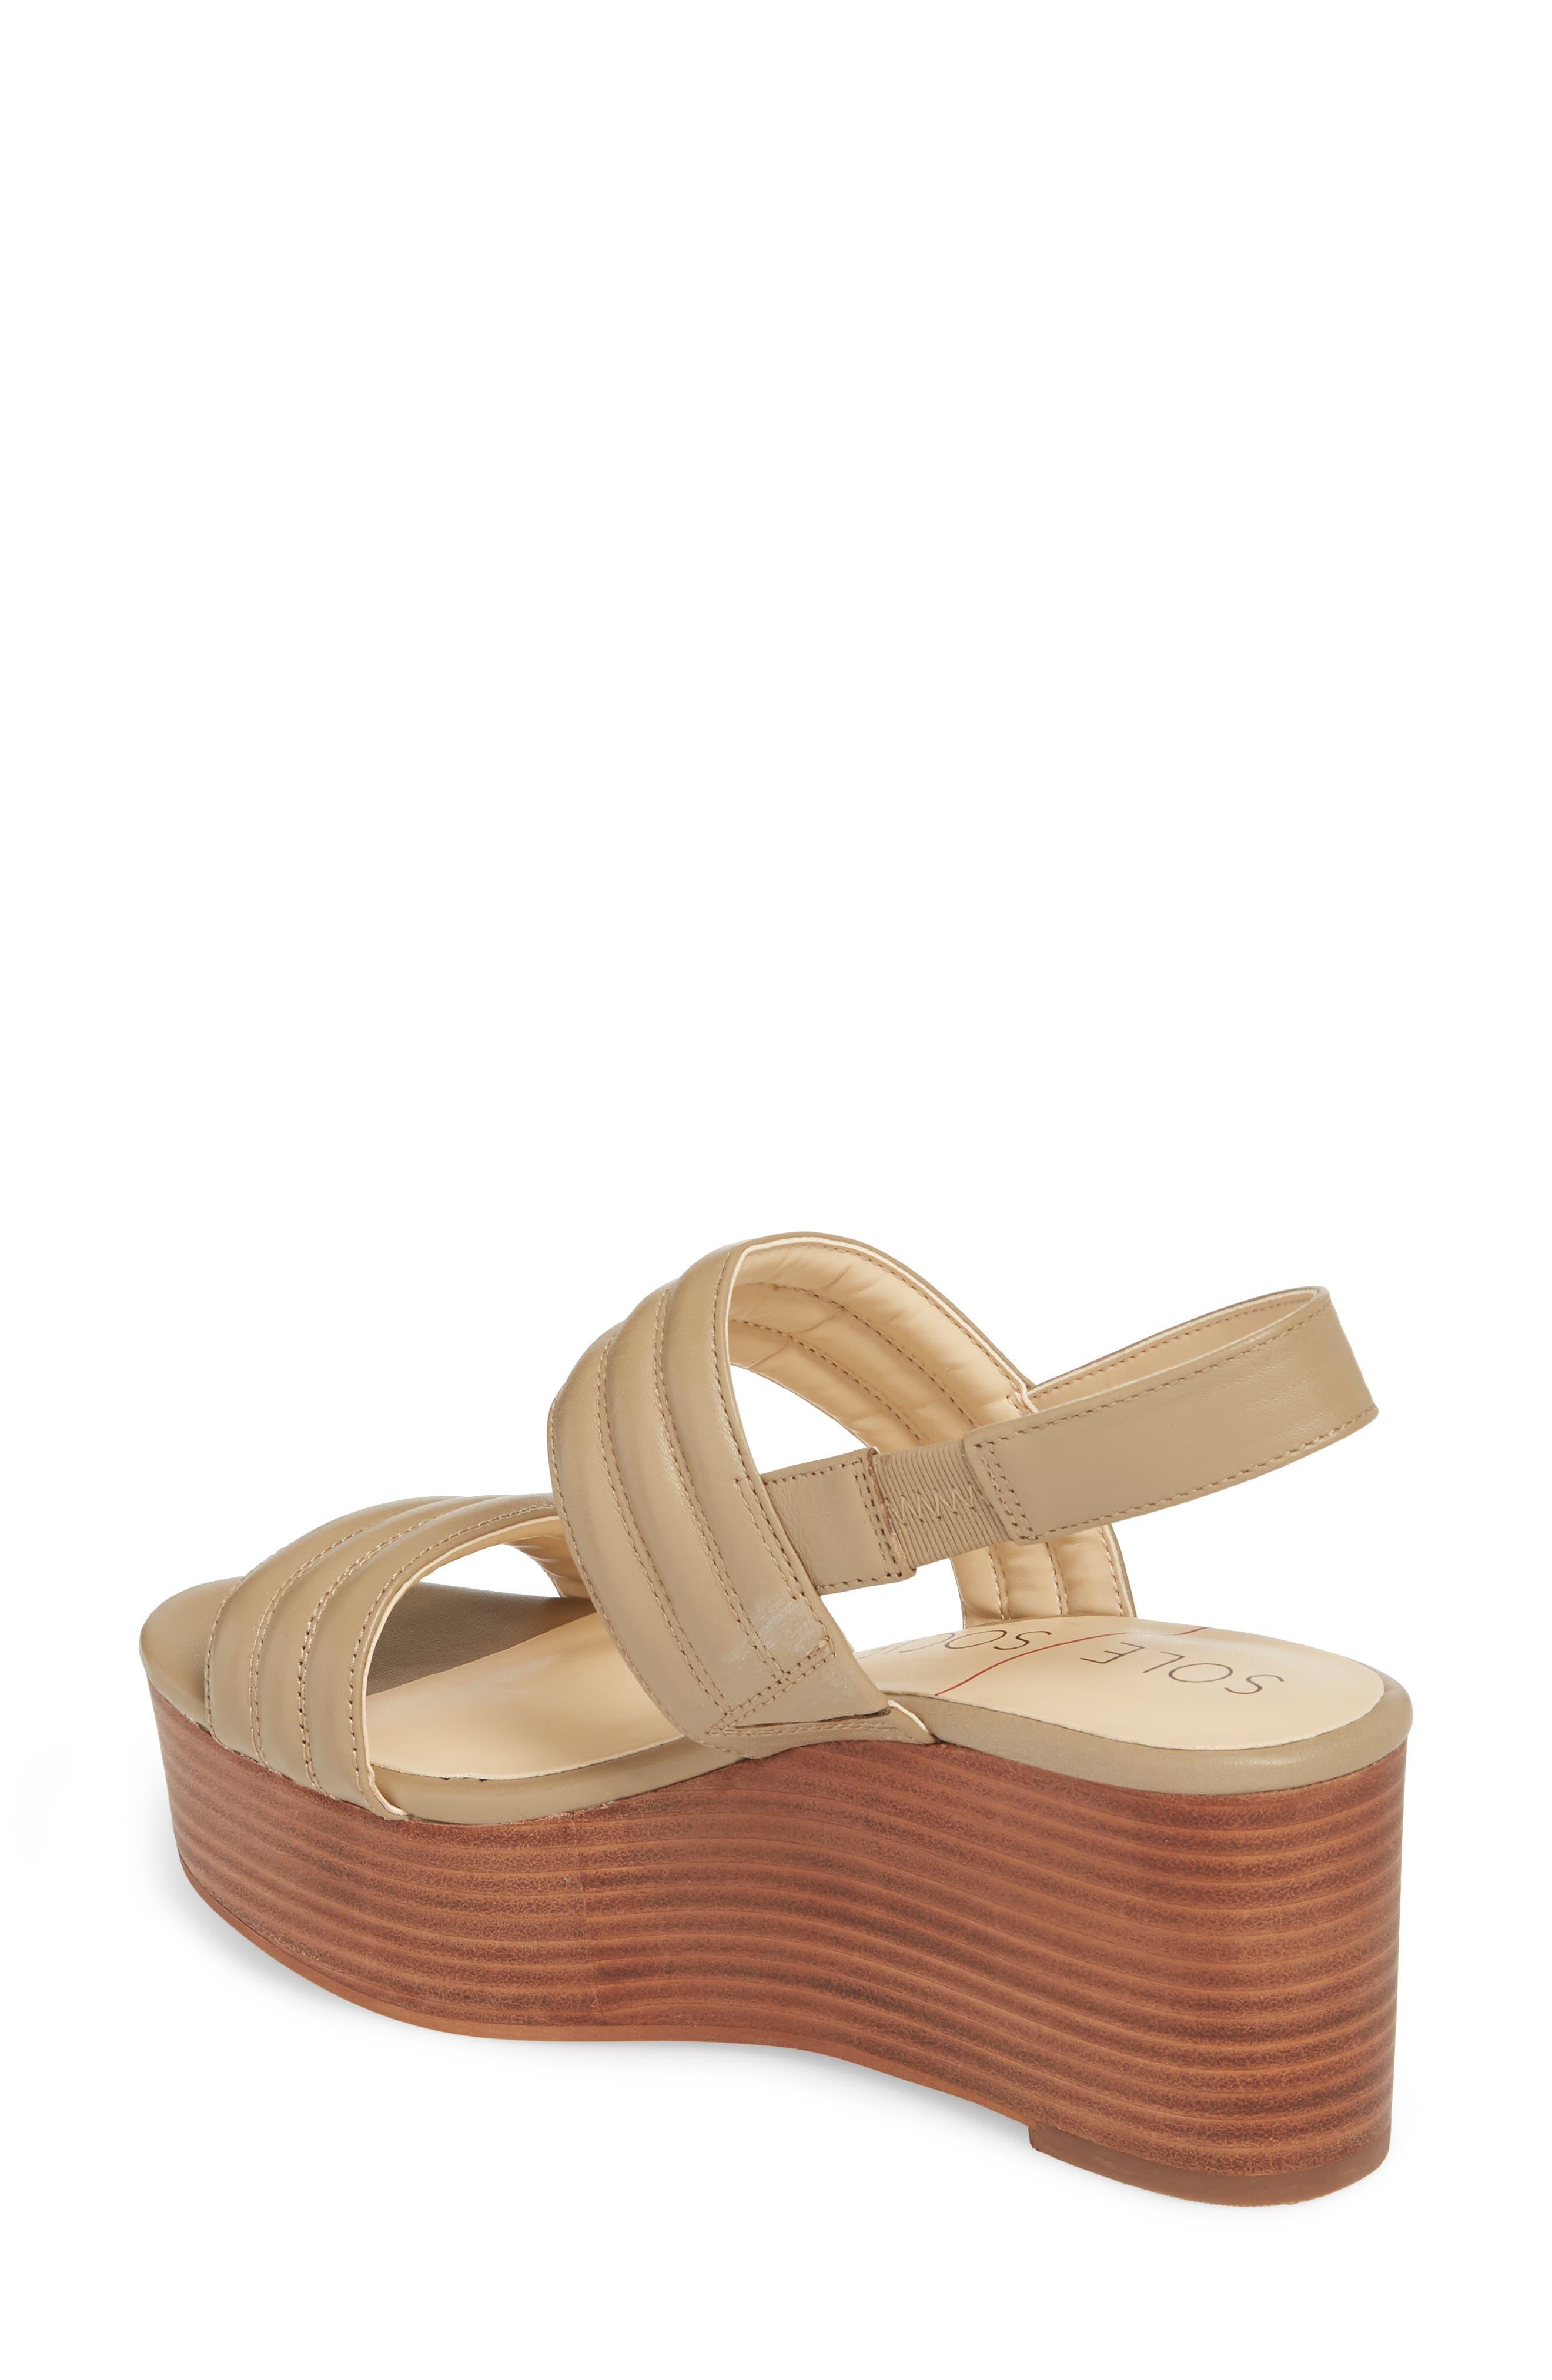 Amberly Platform Sandal,                             Alternate thumbnail 2, color,                             200